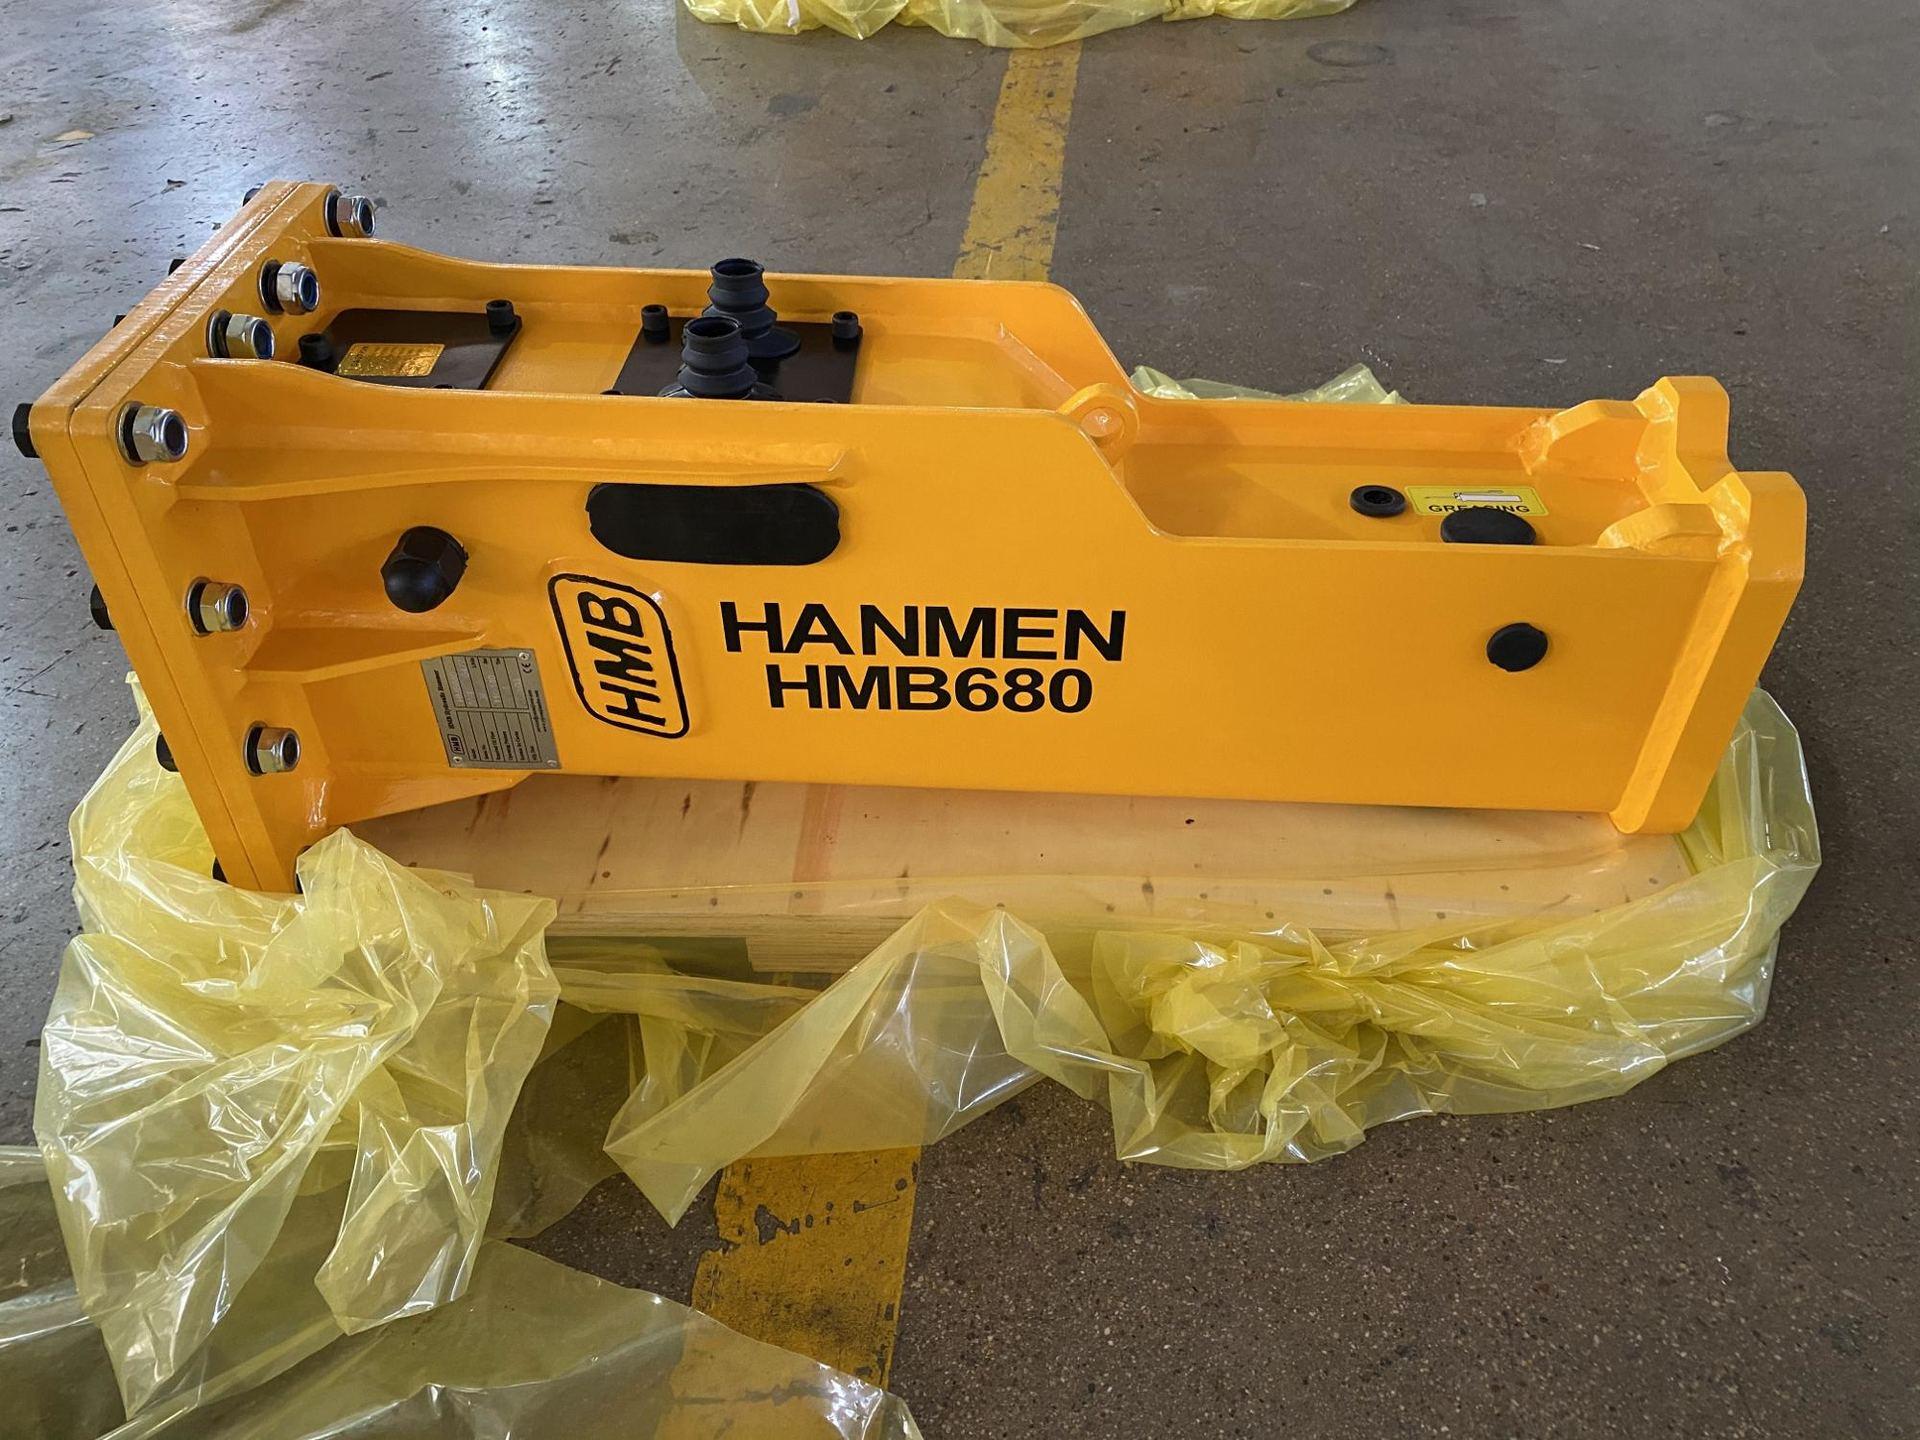 china hydraulic hammer hmb680 excavator stone concrete breaker rock hydraulic breaker